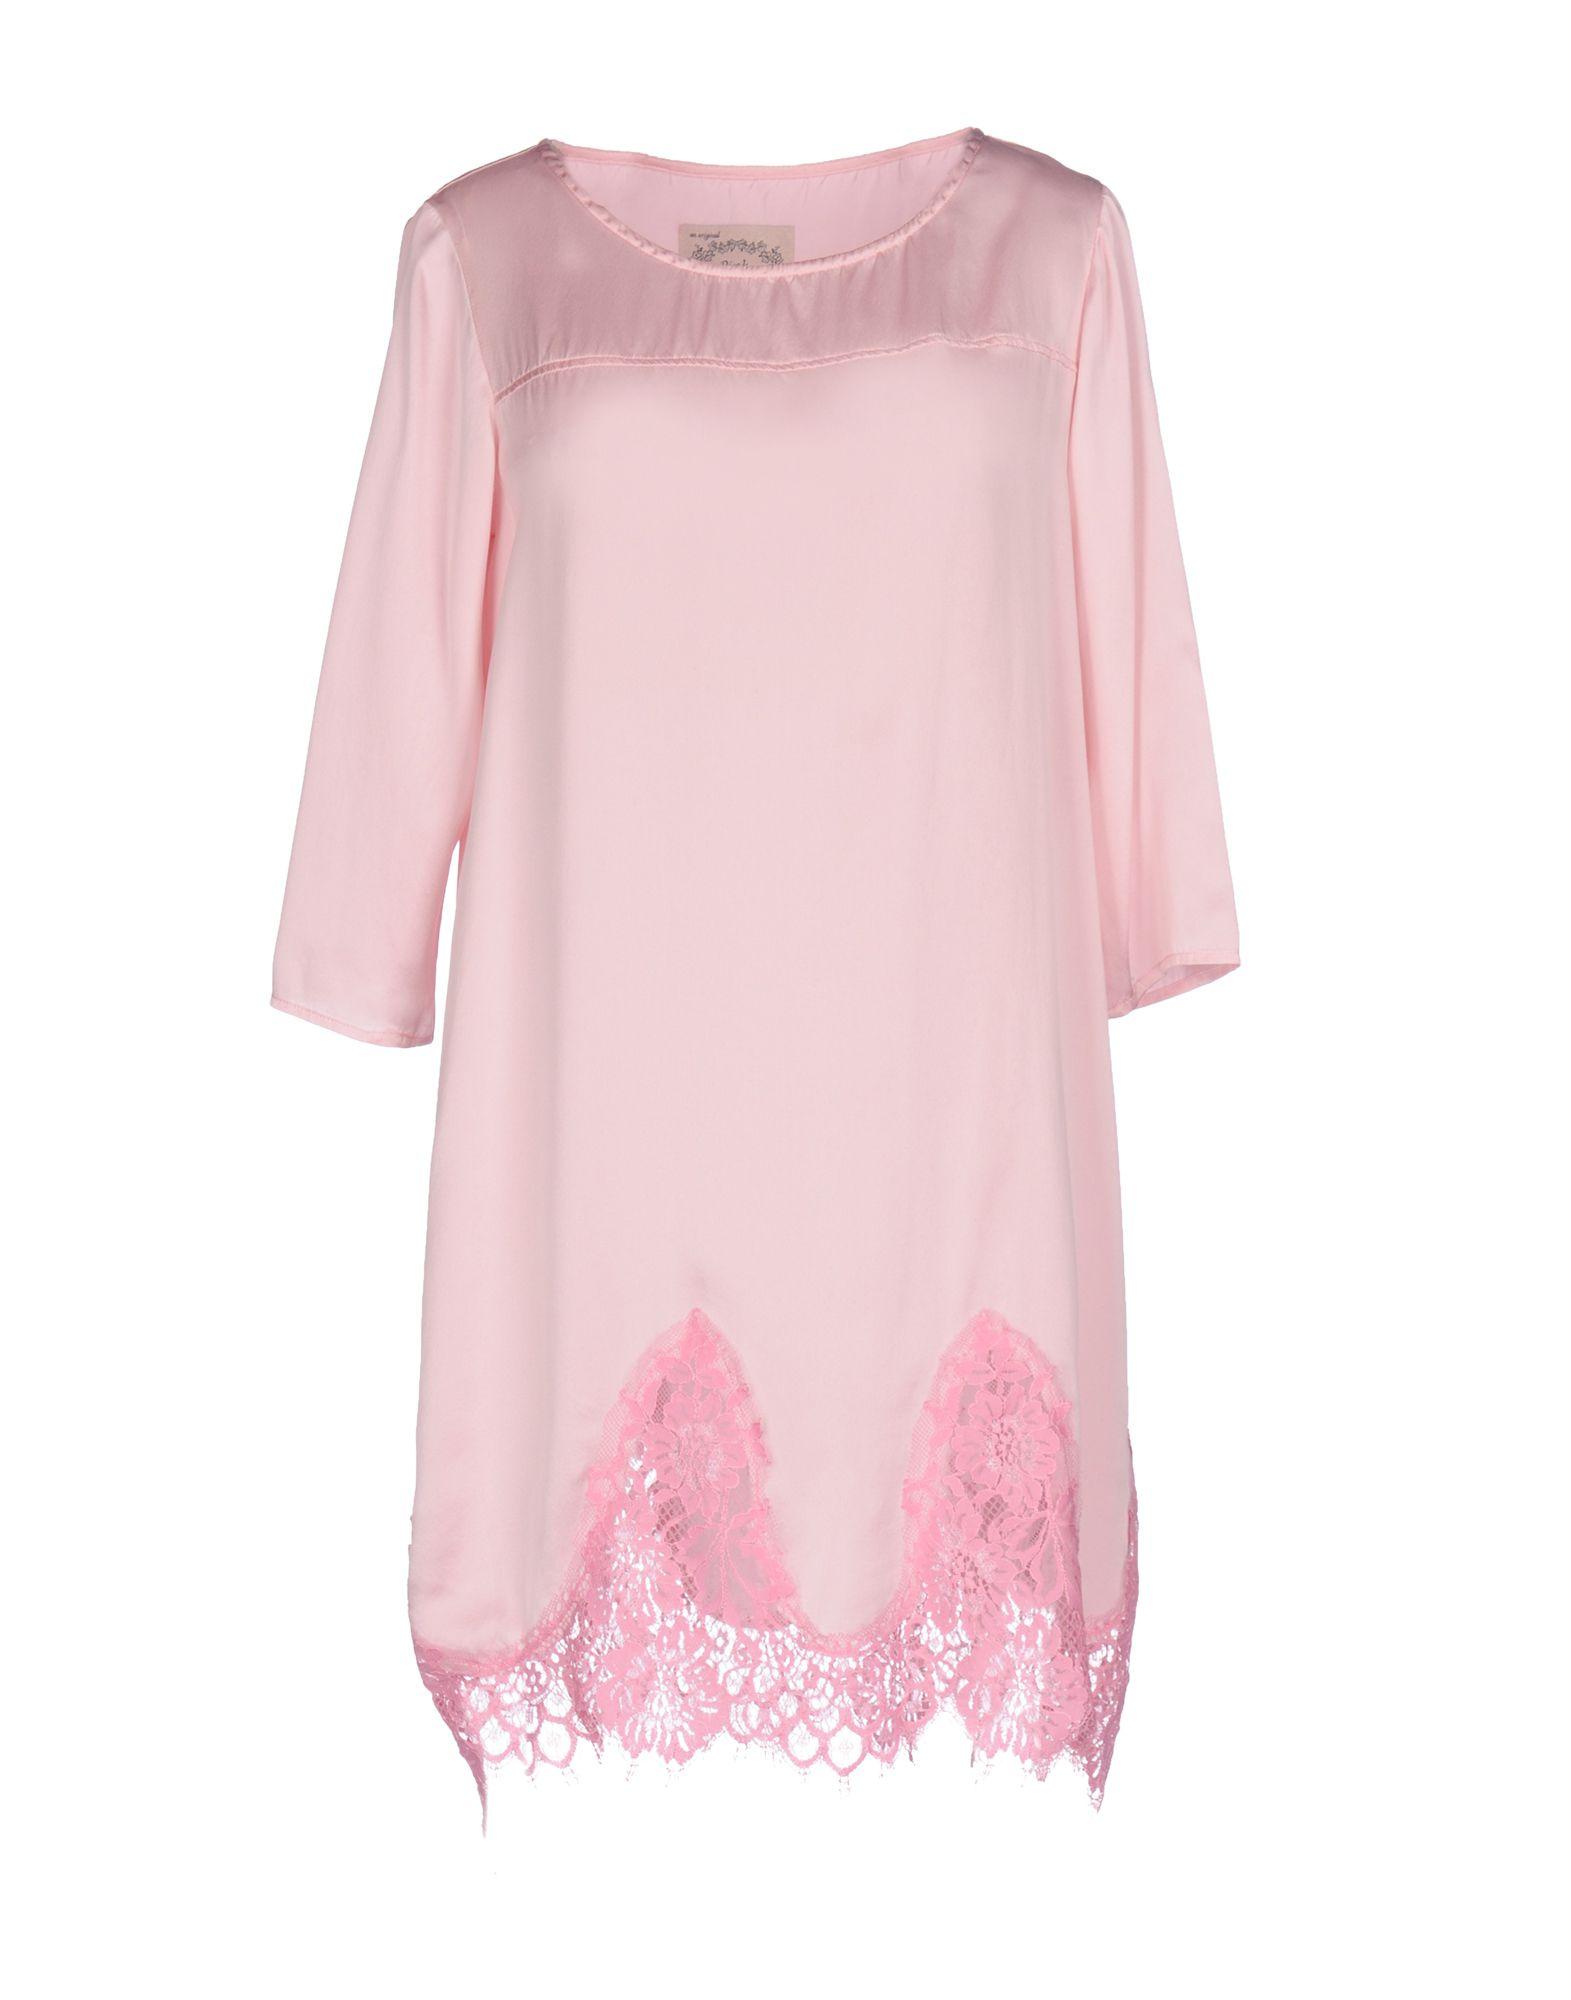 PINK MEMORIES Короткое платье pink memories background 5 7ft vinyl fabric cloth цифровая печать photo studio backdrop s 3045